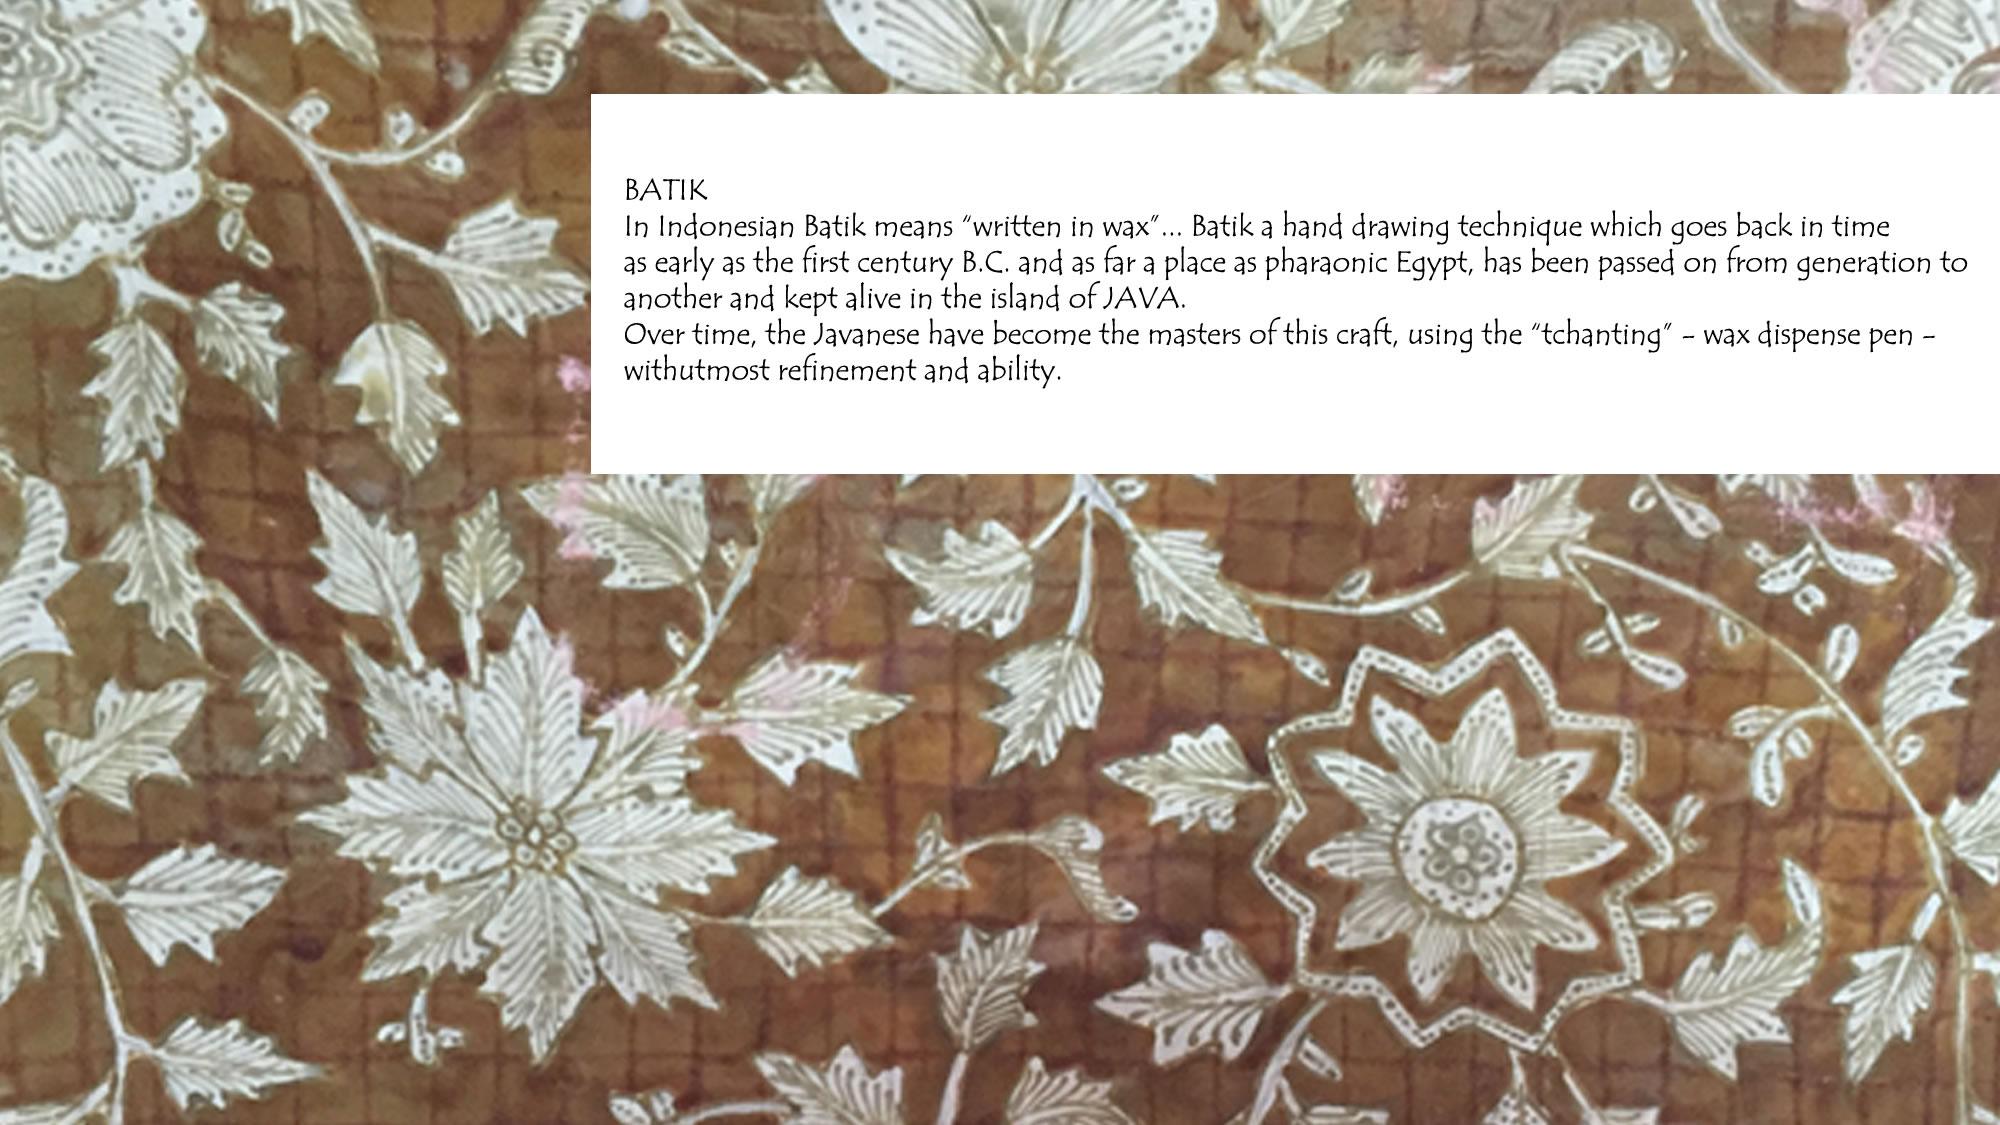 8- batik textiles techniques.jpg